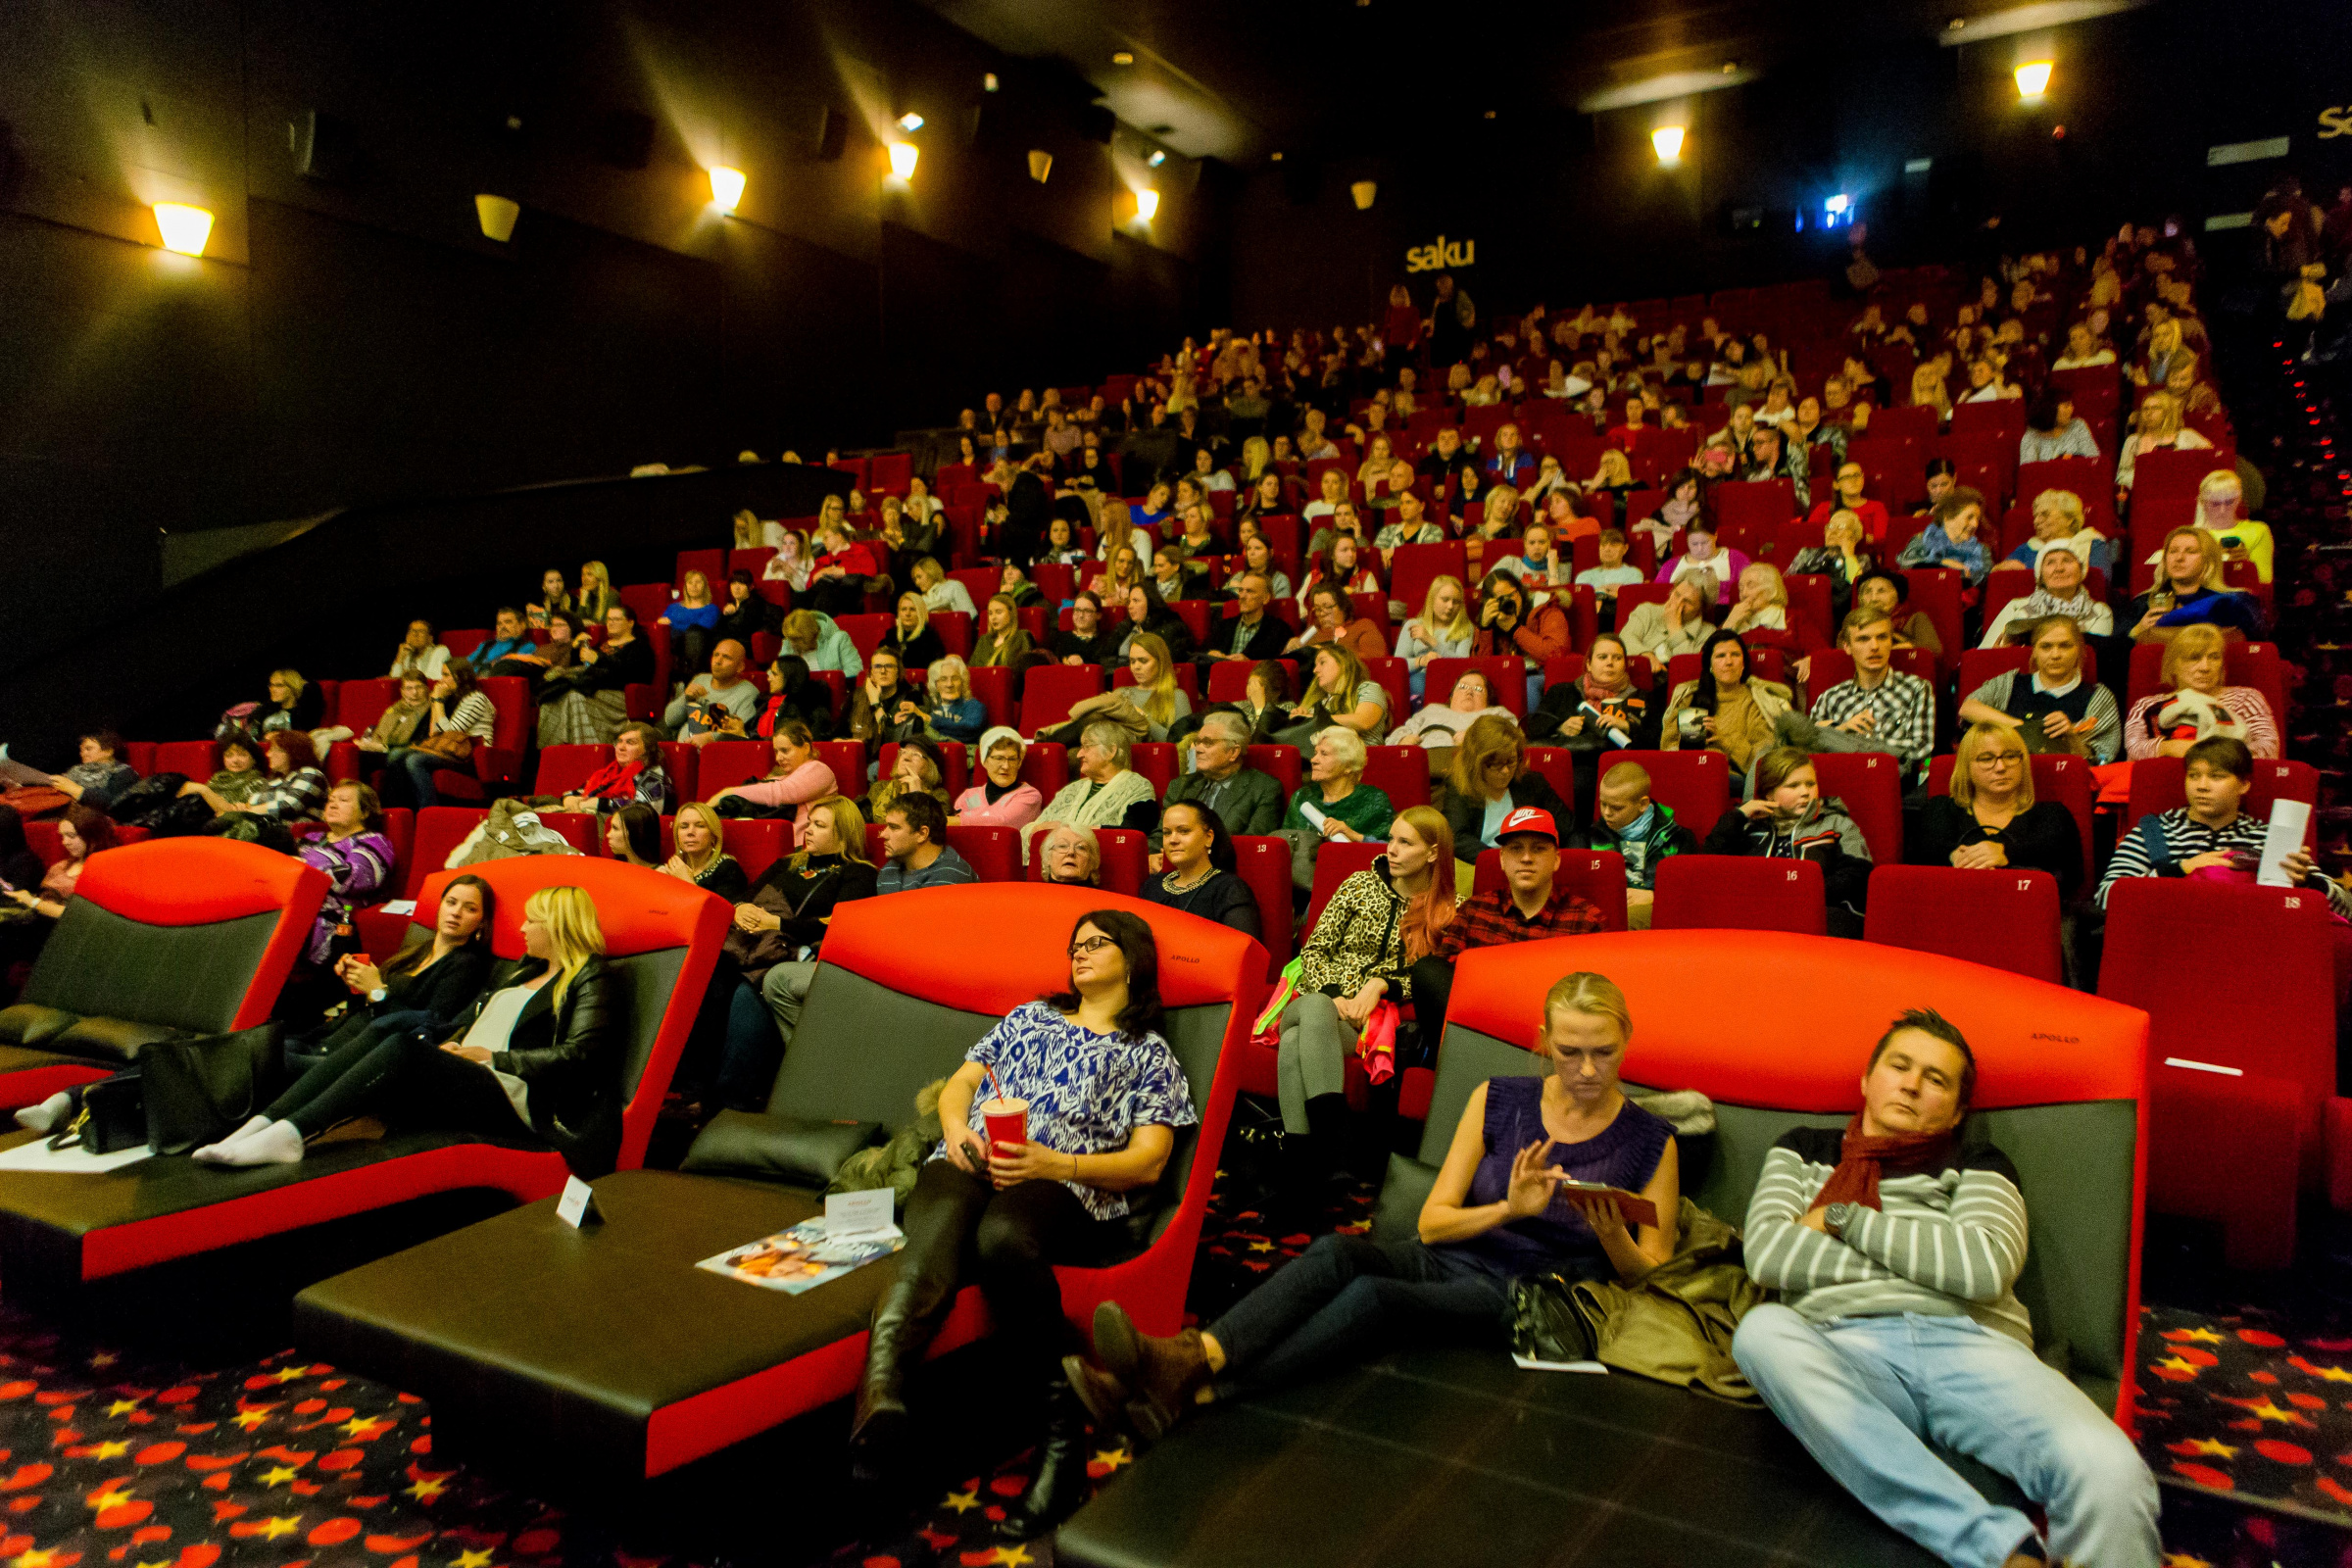 Majandus.ee: Kino. Solaris Apollo. Foto: EESTI MEEDIA/SCANPIX BALTICS/Madis Sinivee